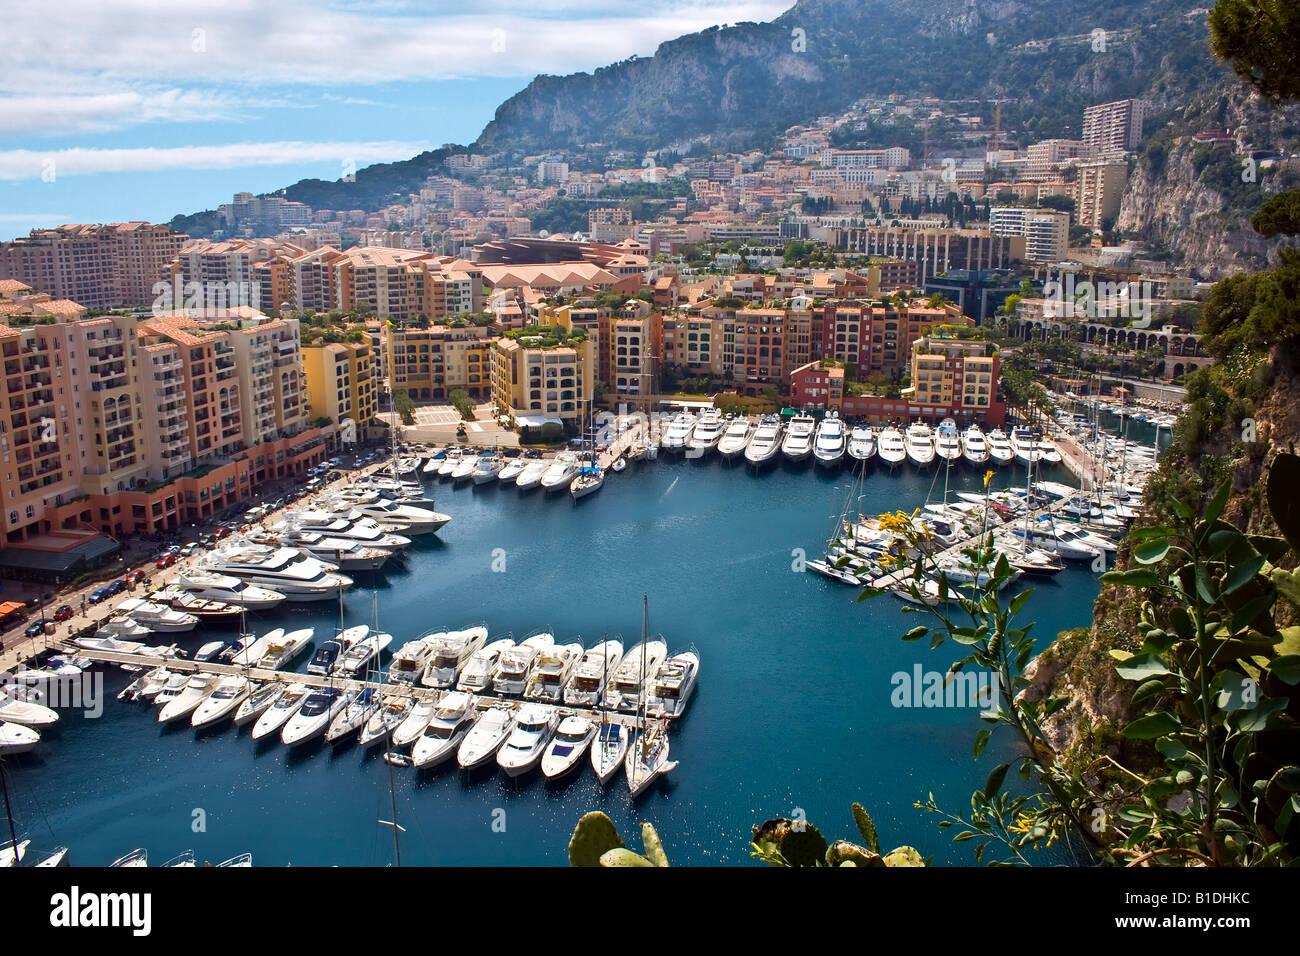 MONACO, MONTE CARLO. Luxury bay in Monte Carlo Principality Monaco Europe - Stock Image